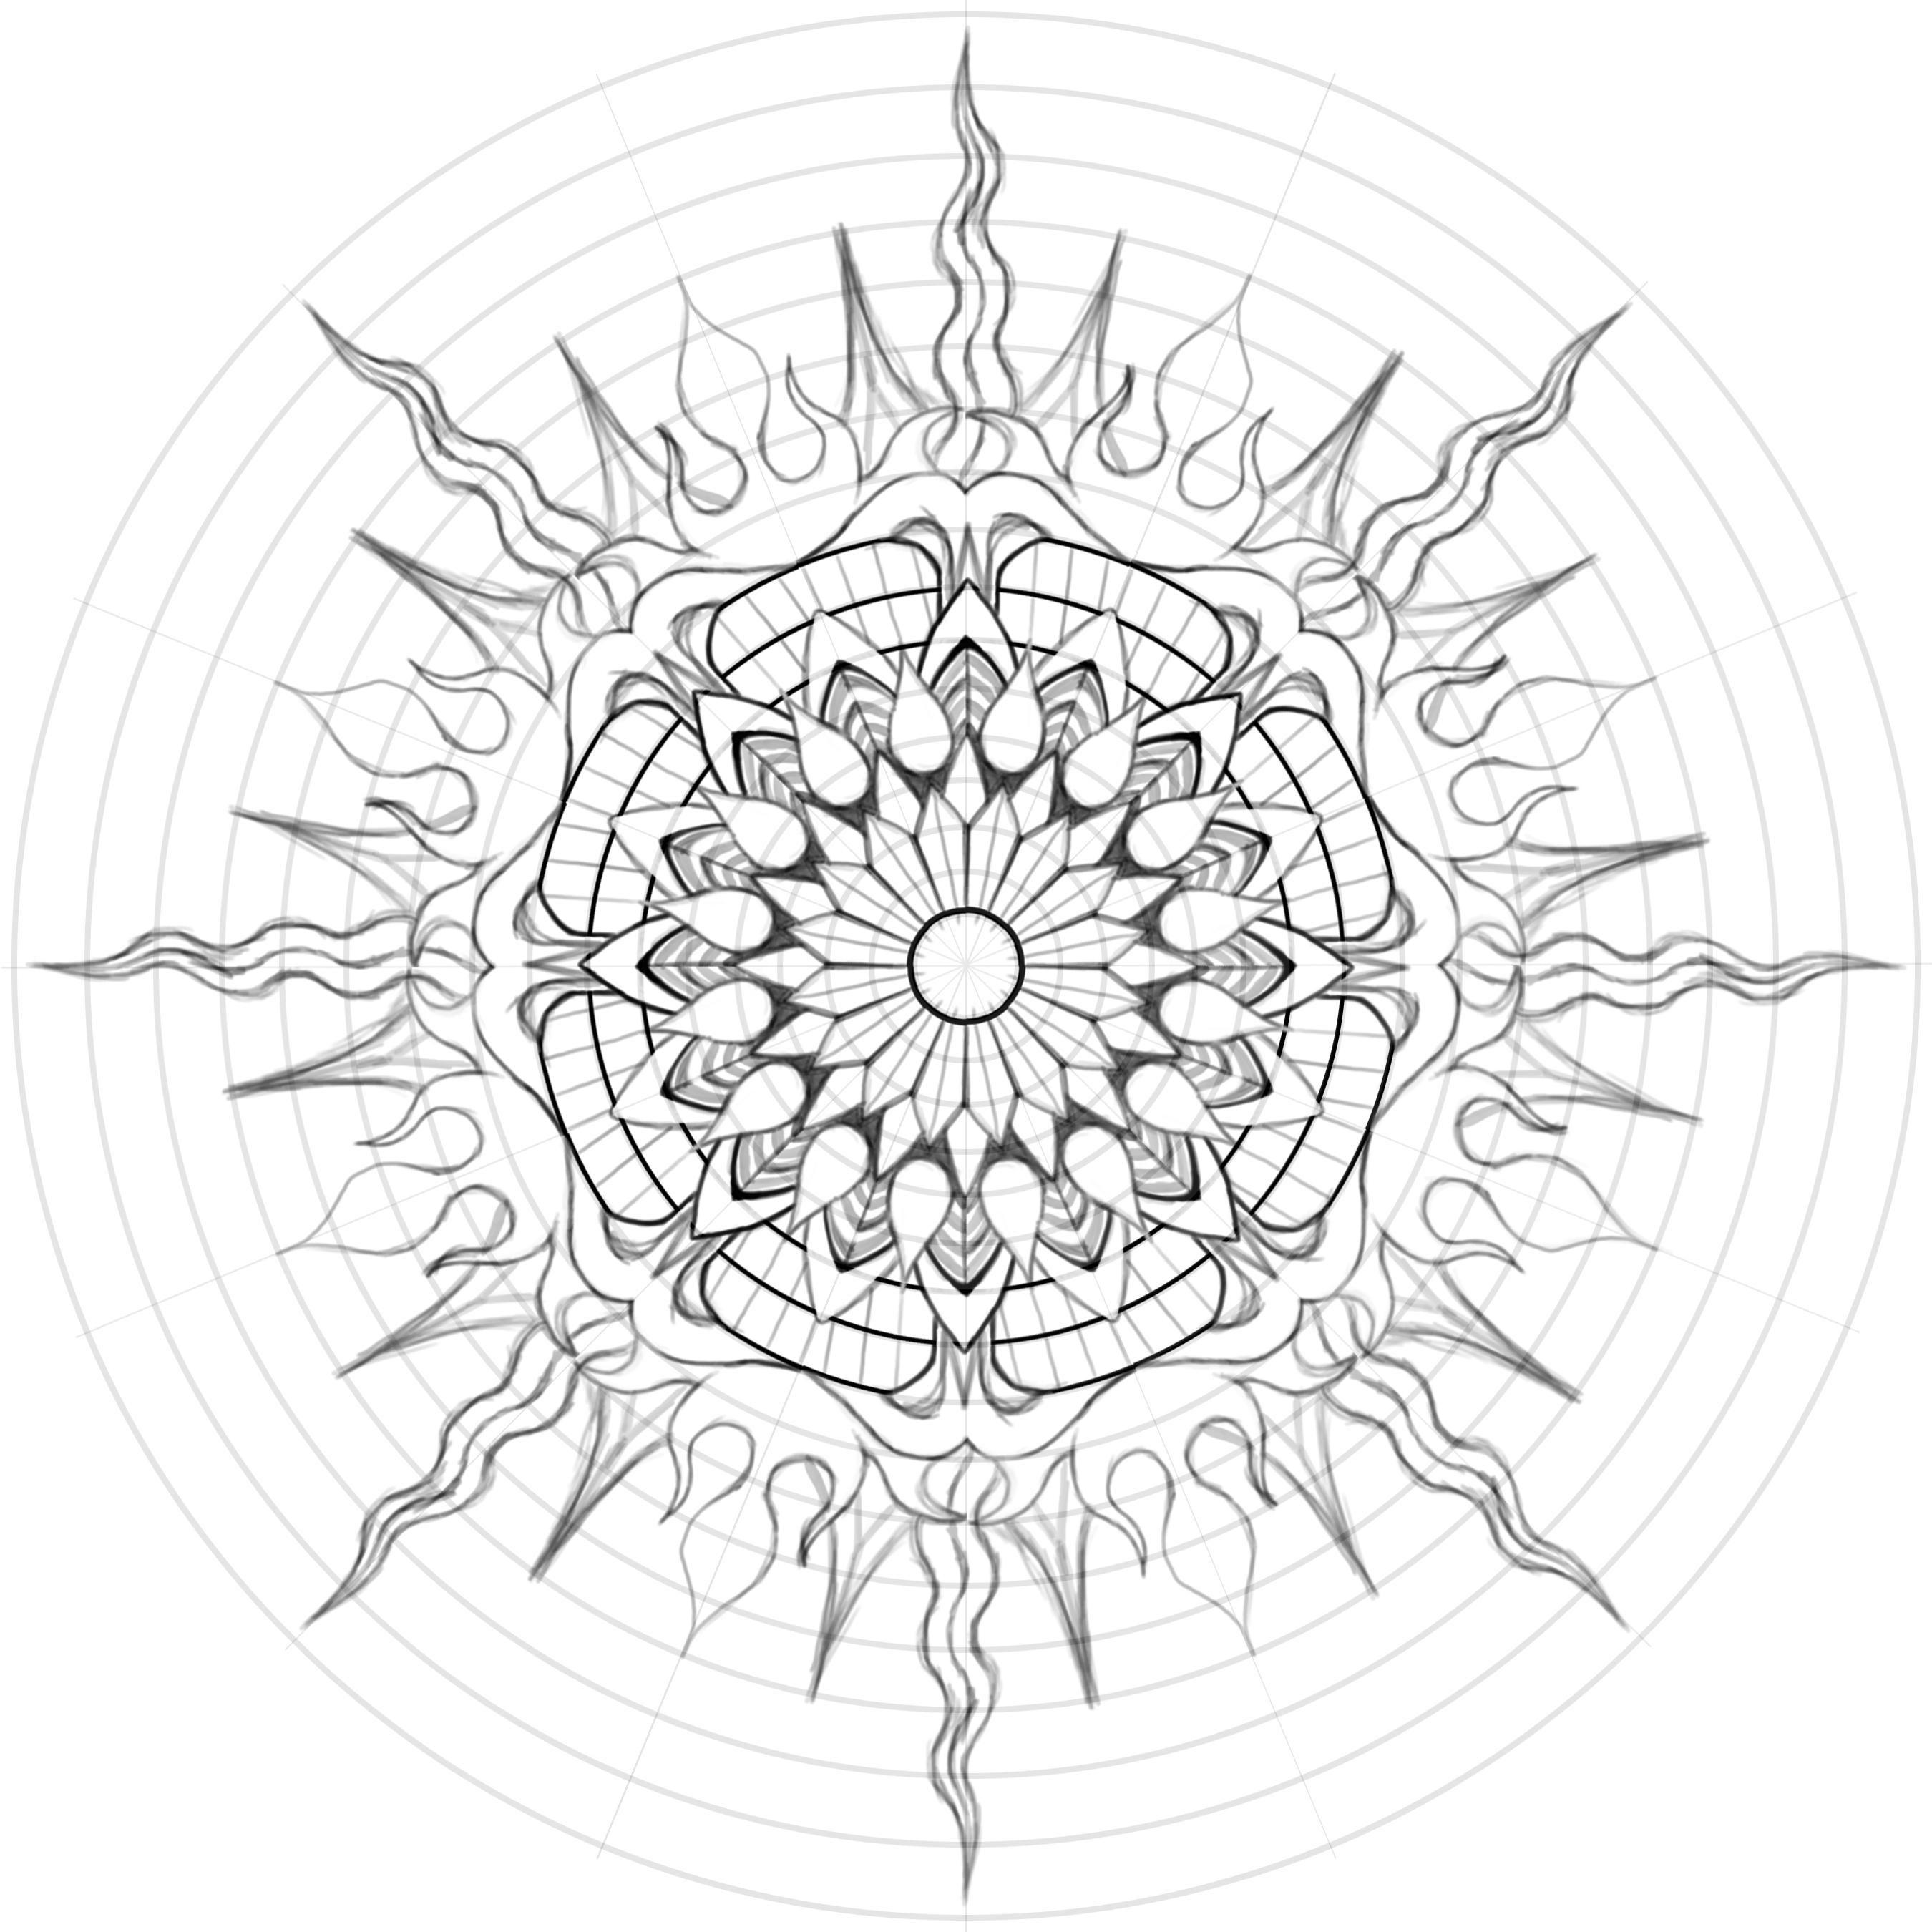 water mandala coloring pages | Art Deco Fire Water Mandala? by Gabe McGinn - Skillshare ...